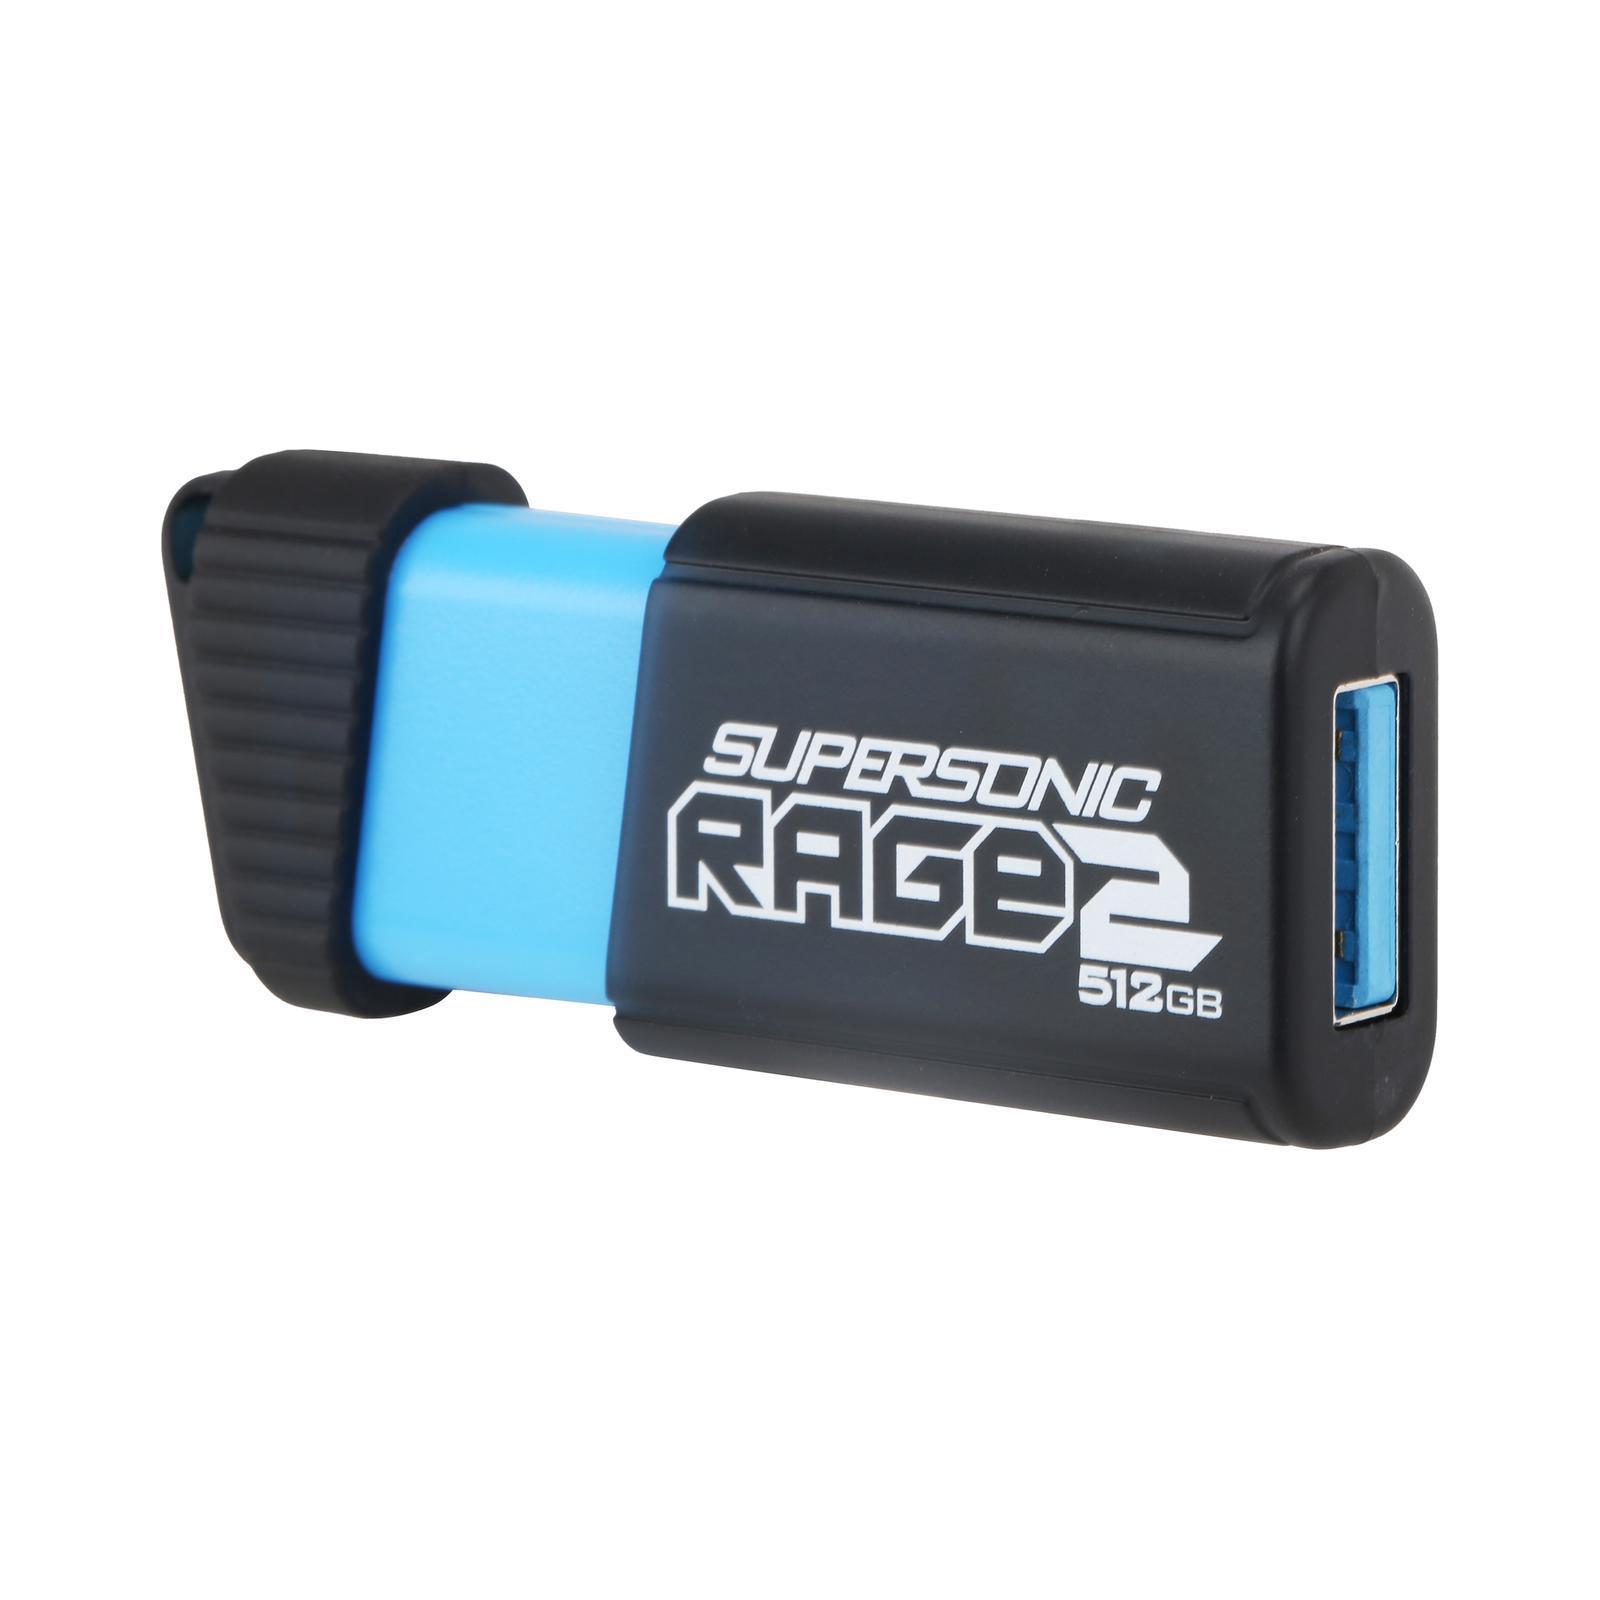 USB флеш накопитель Patriot 512GB Supersonic Rage 2 USB 3.1 (PEF512GSR2USB) изображение 2